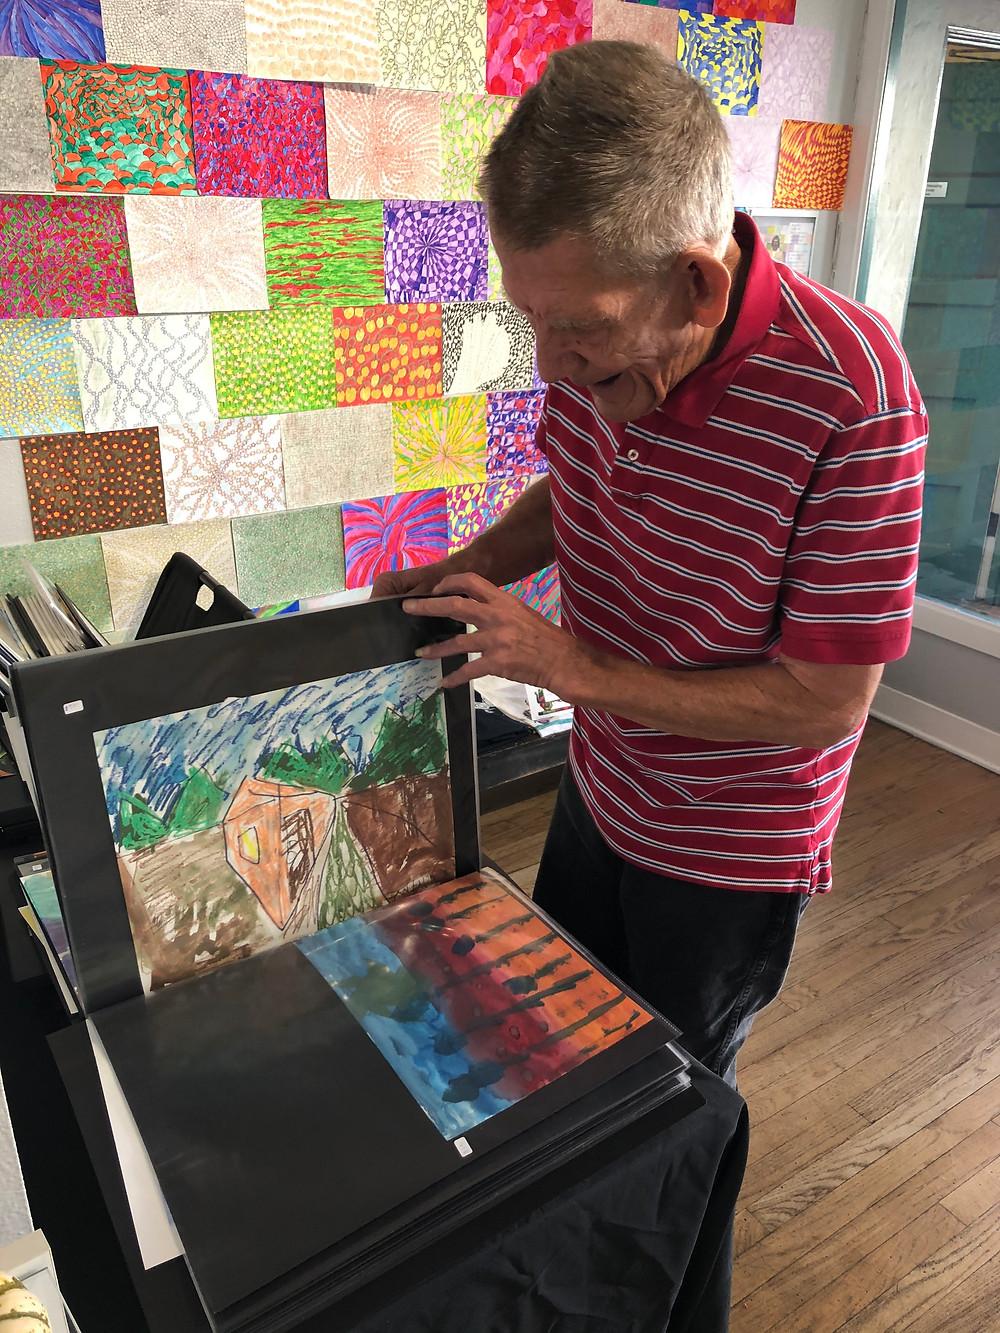 Artist John Houston looking through his portfolio of work in Santa Barbara Art Works front gallery.